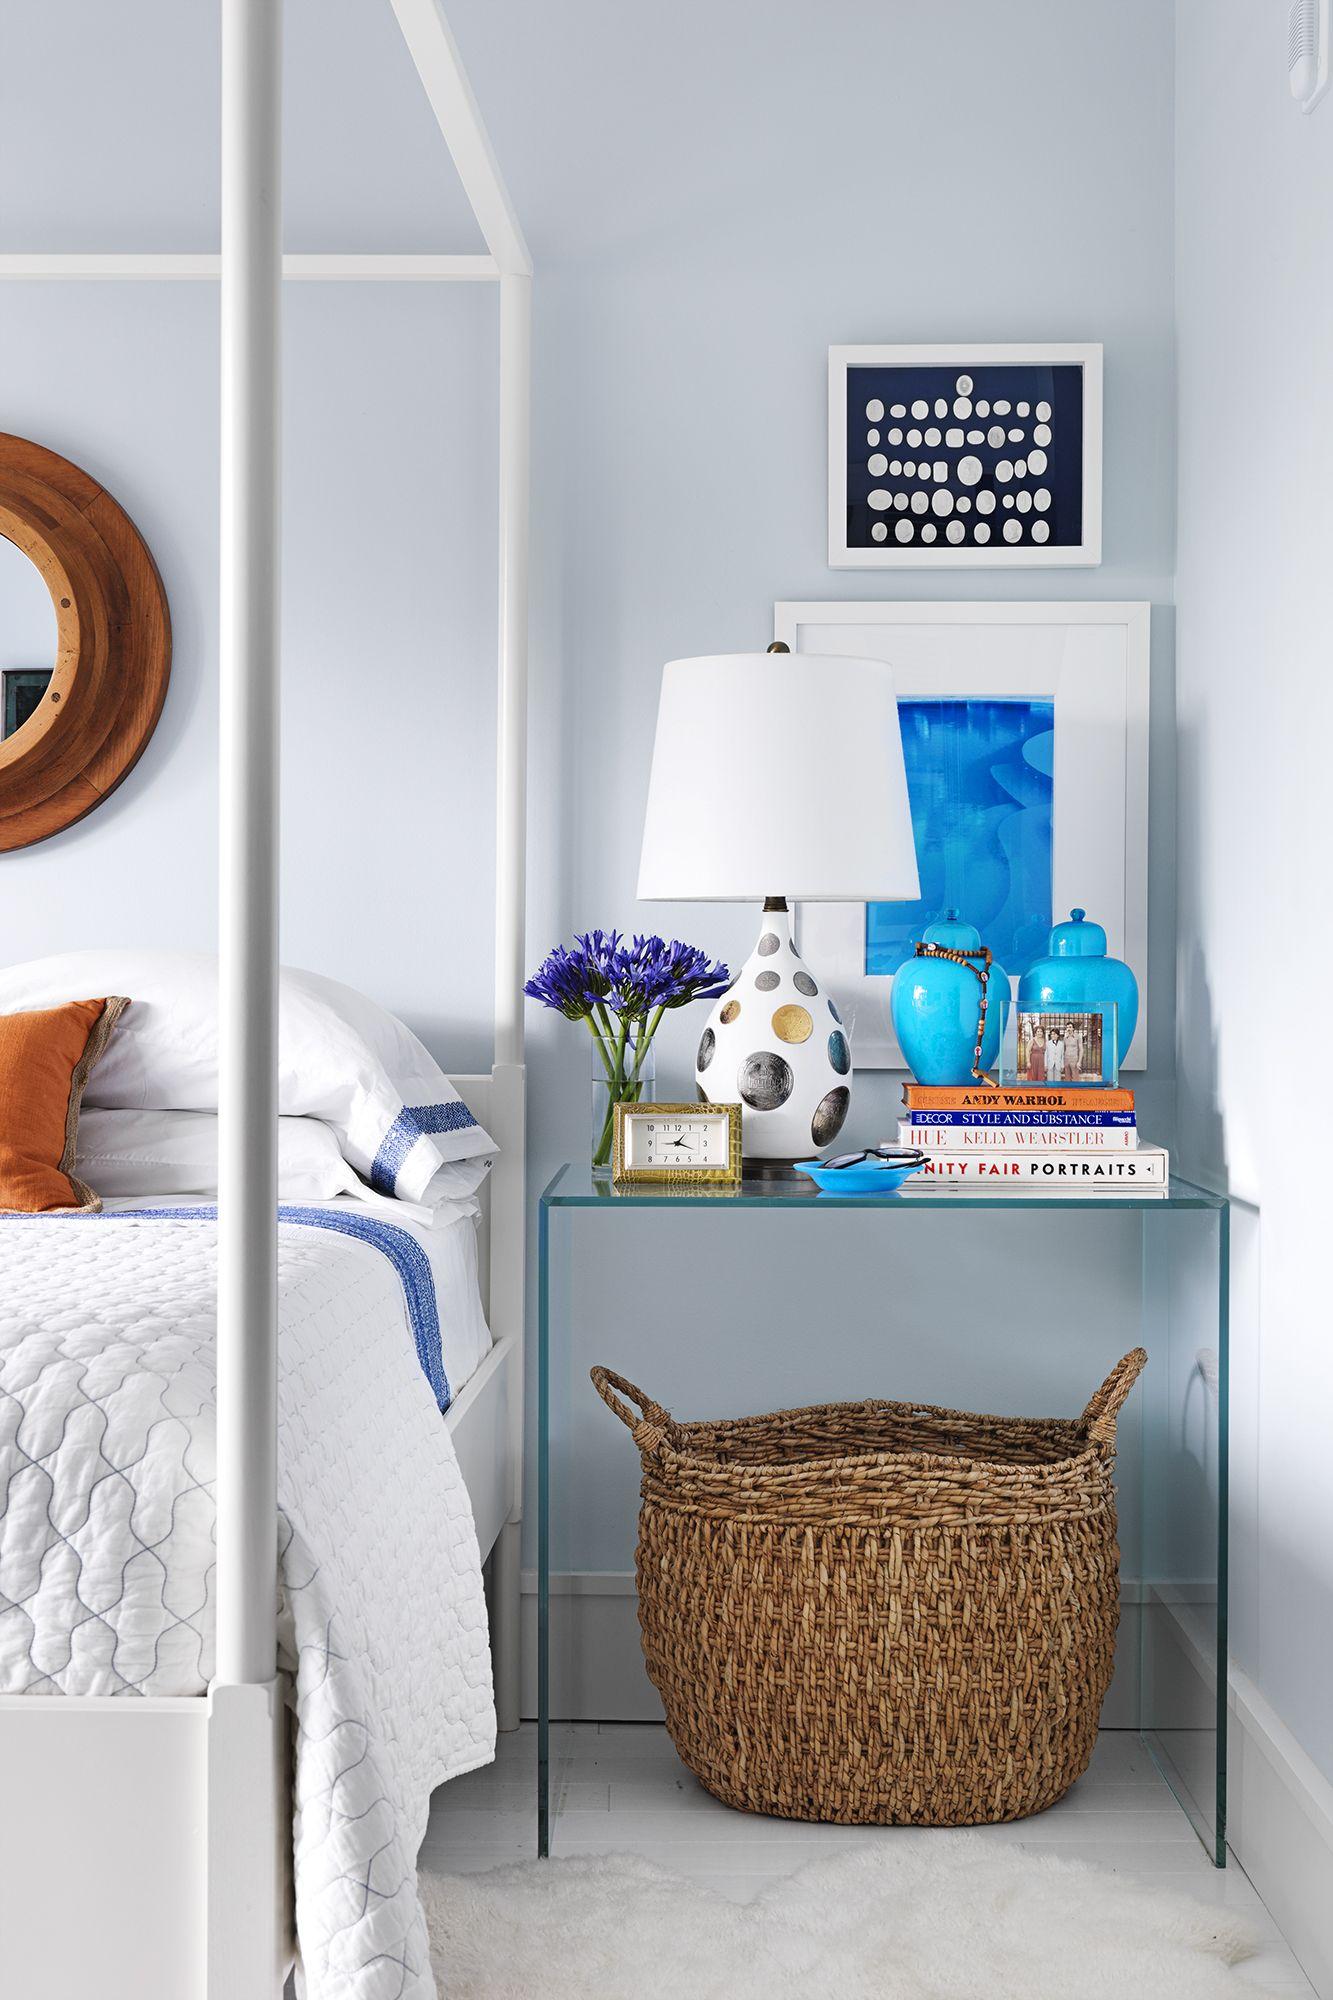 5 Bedroom Storage Hacks - Bedroom Organization Ideas